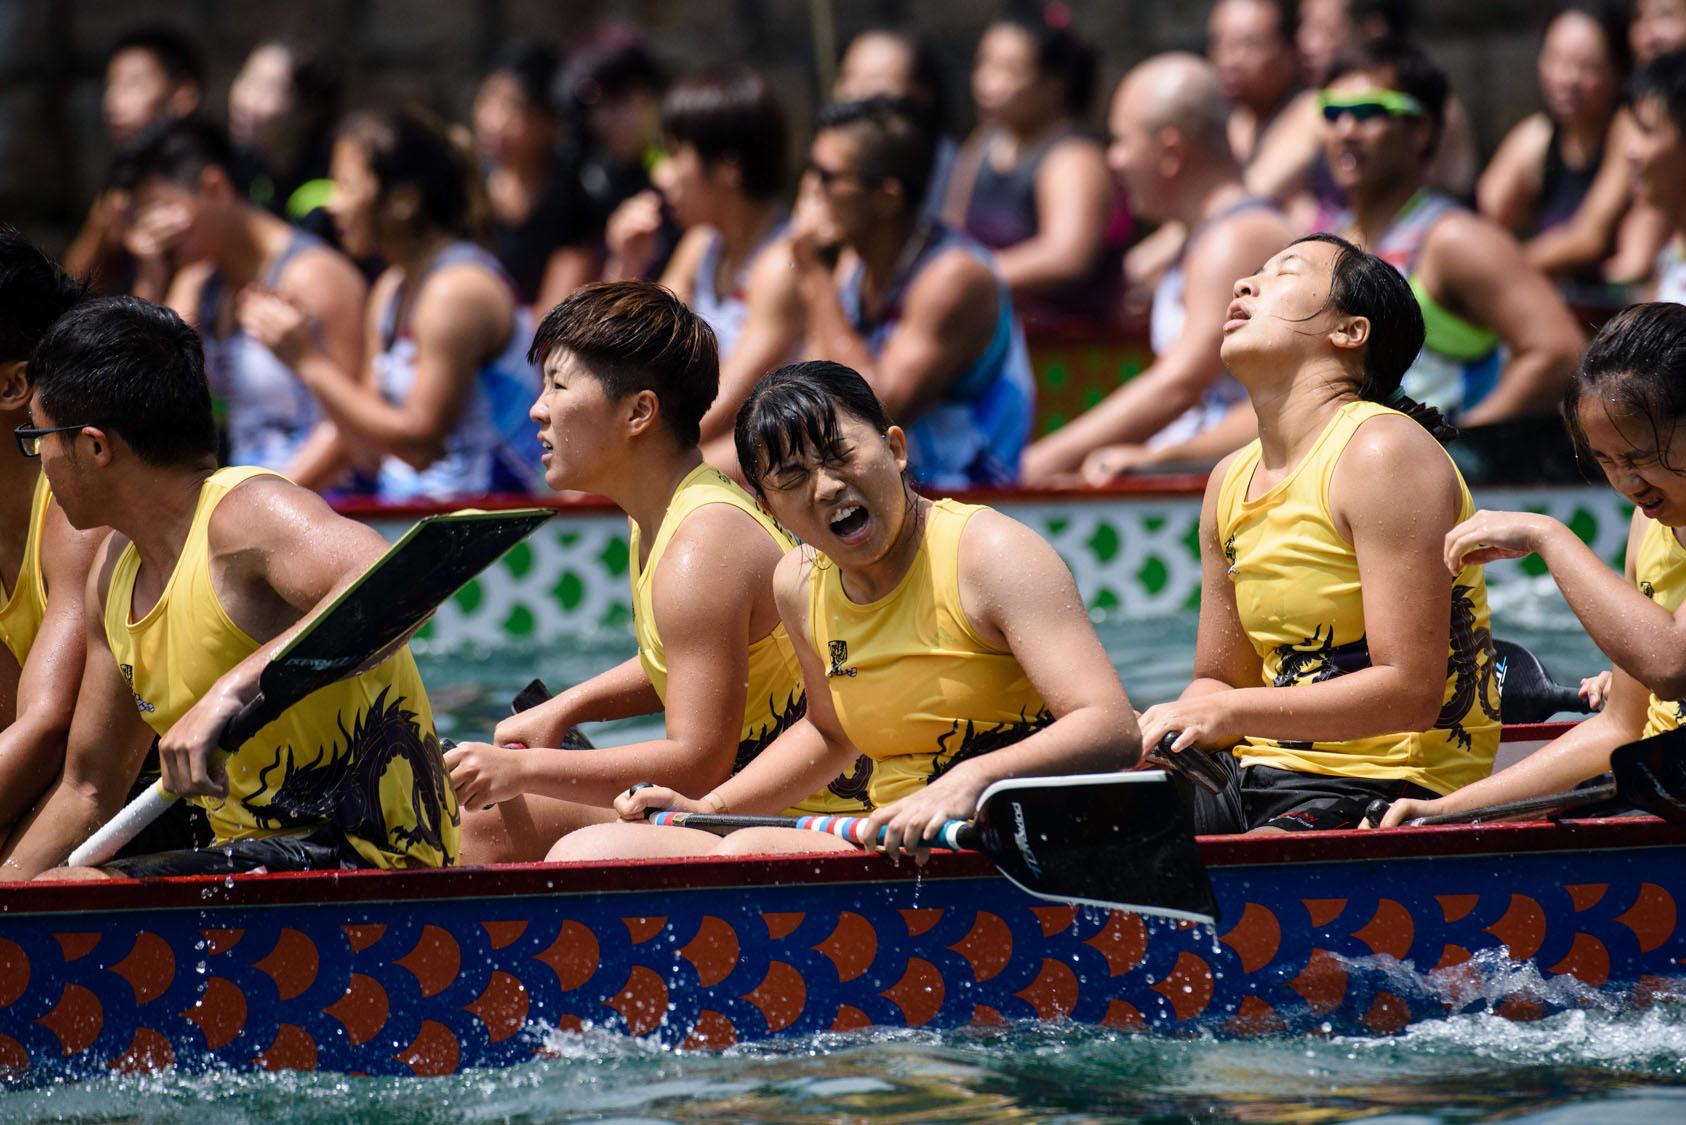 Annual dragon boat race in Hong Kong